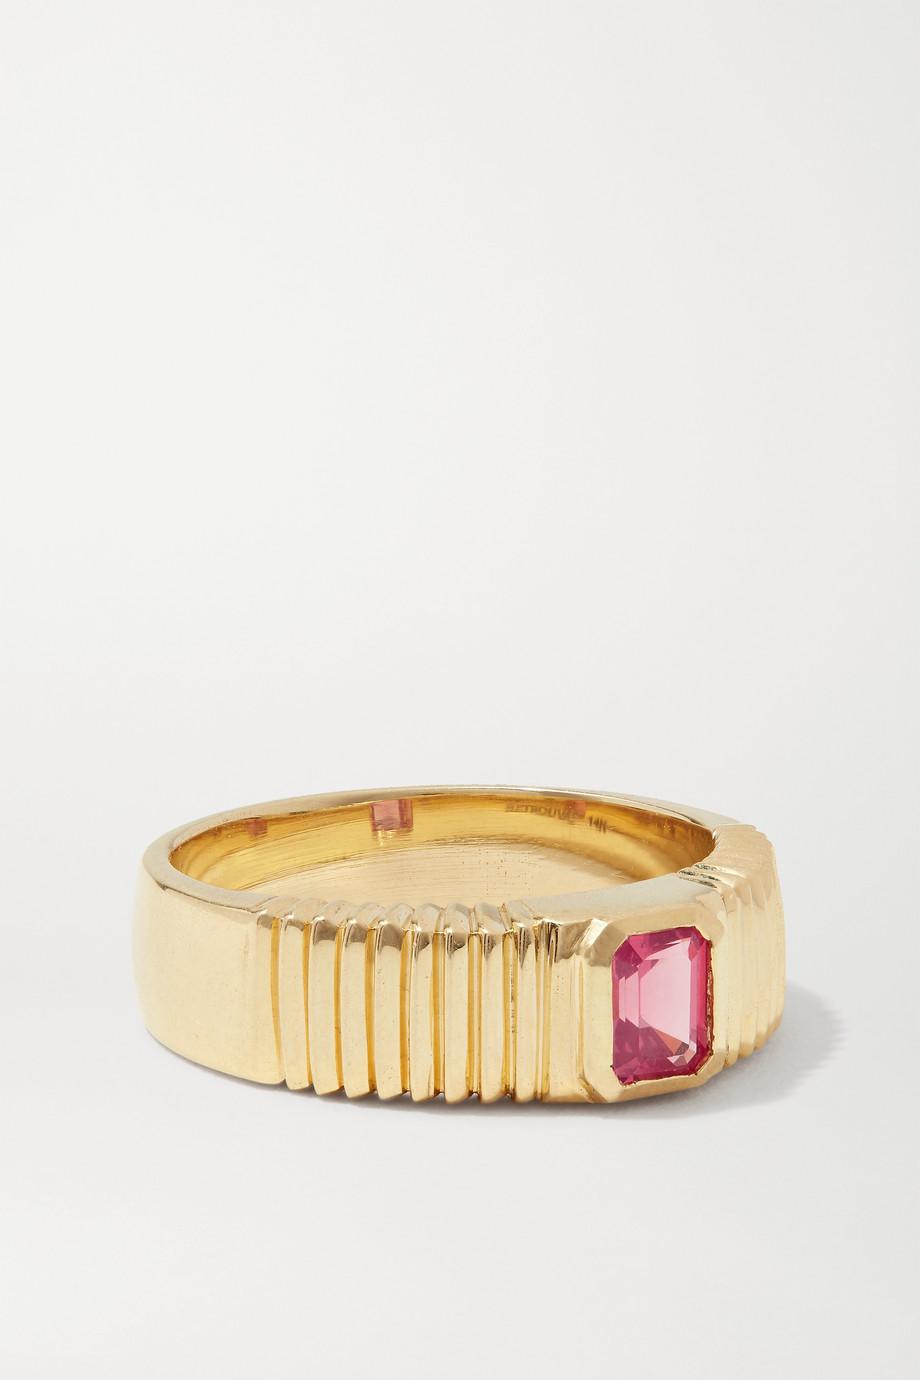 Retrouvaí 14-karat gold spinel ring